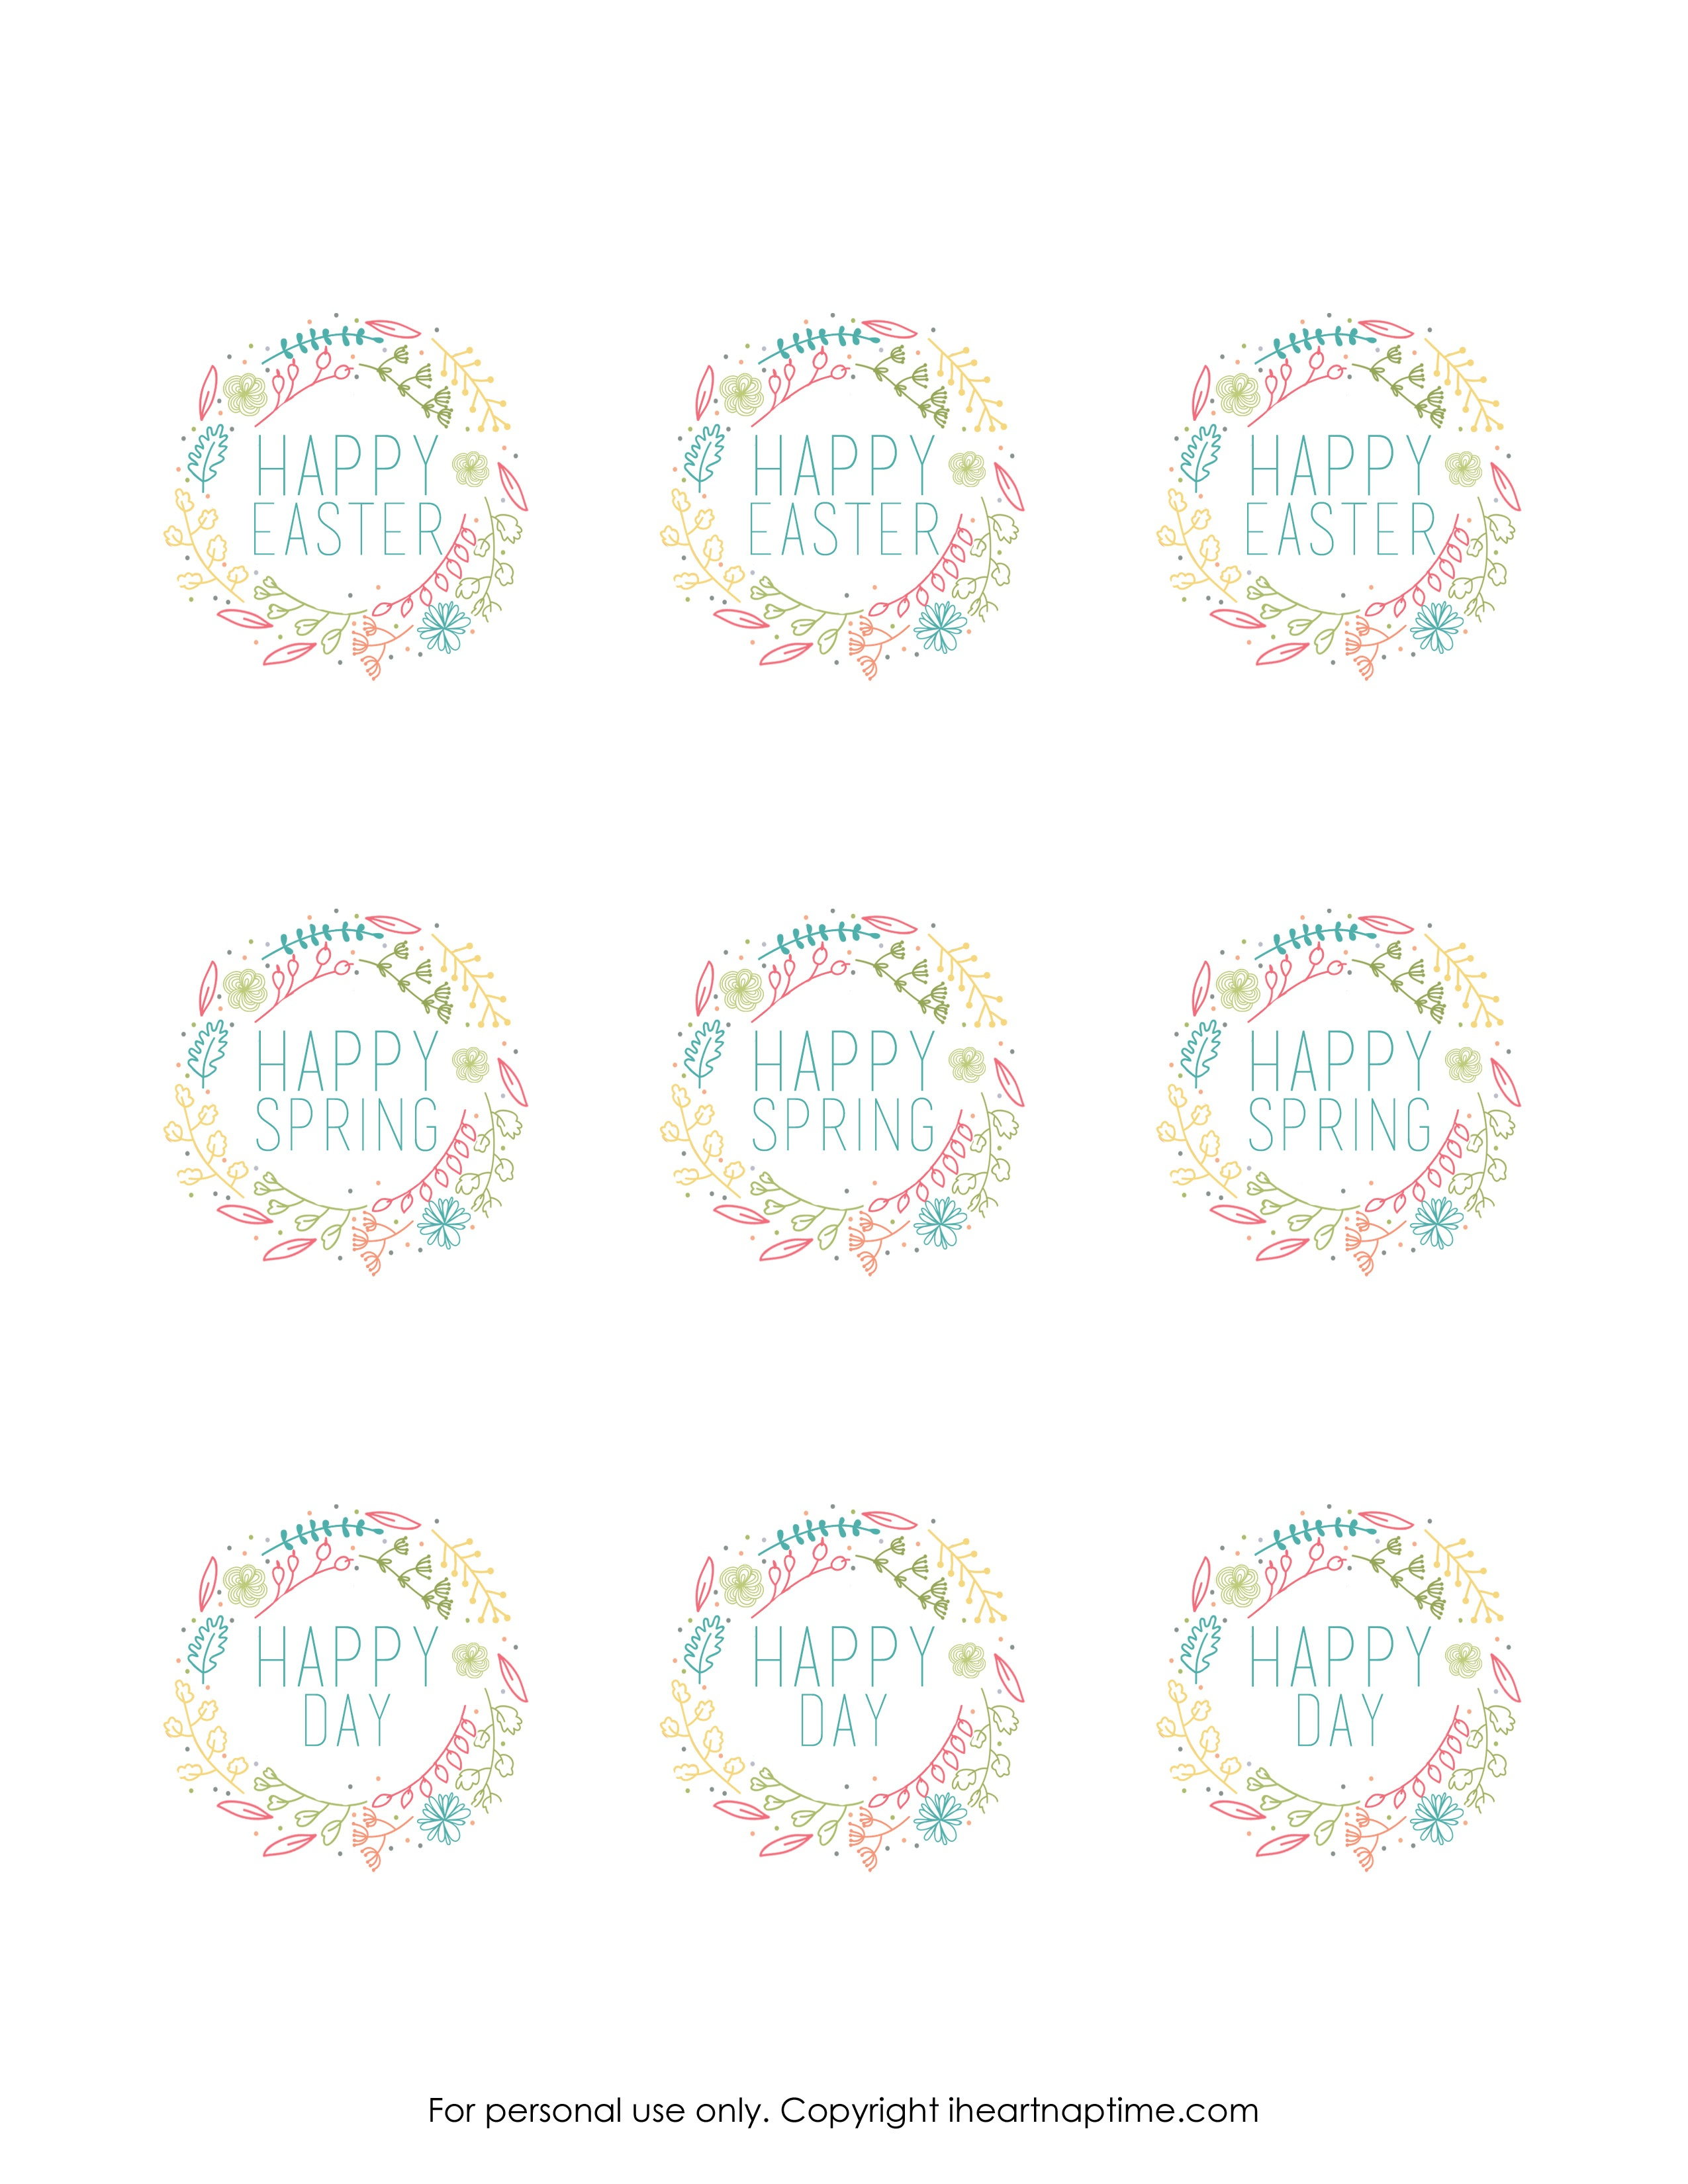 Free Printable Tags Free Printable Labels Lovely Free Spring - Free Printable Tags